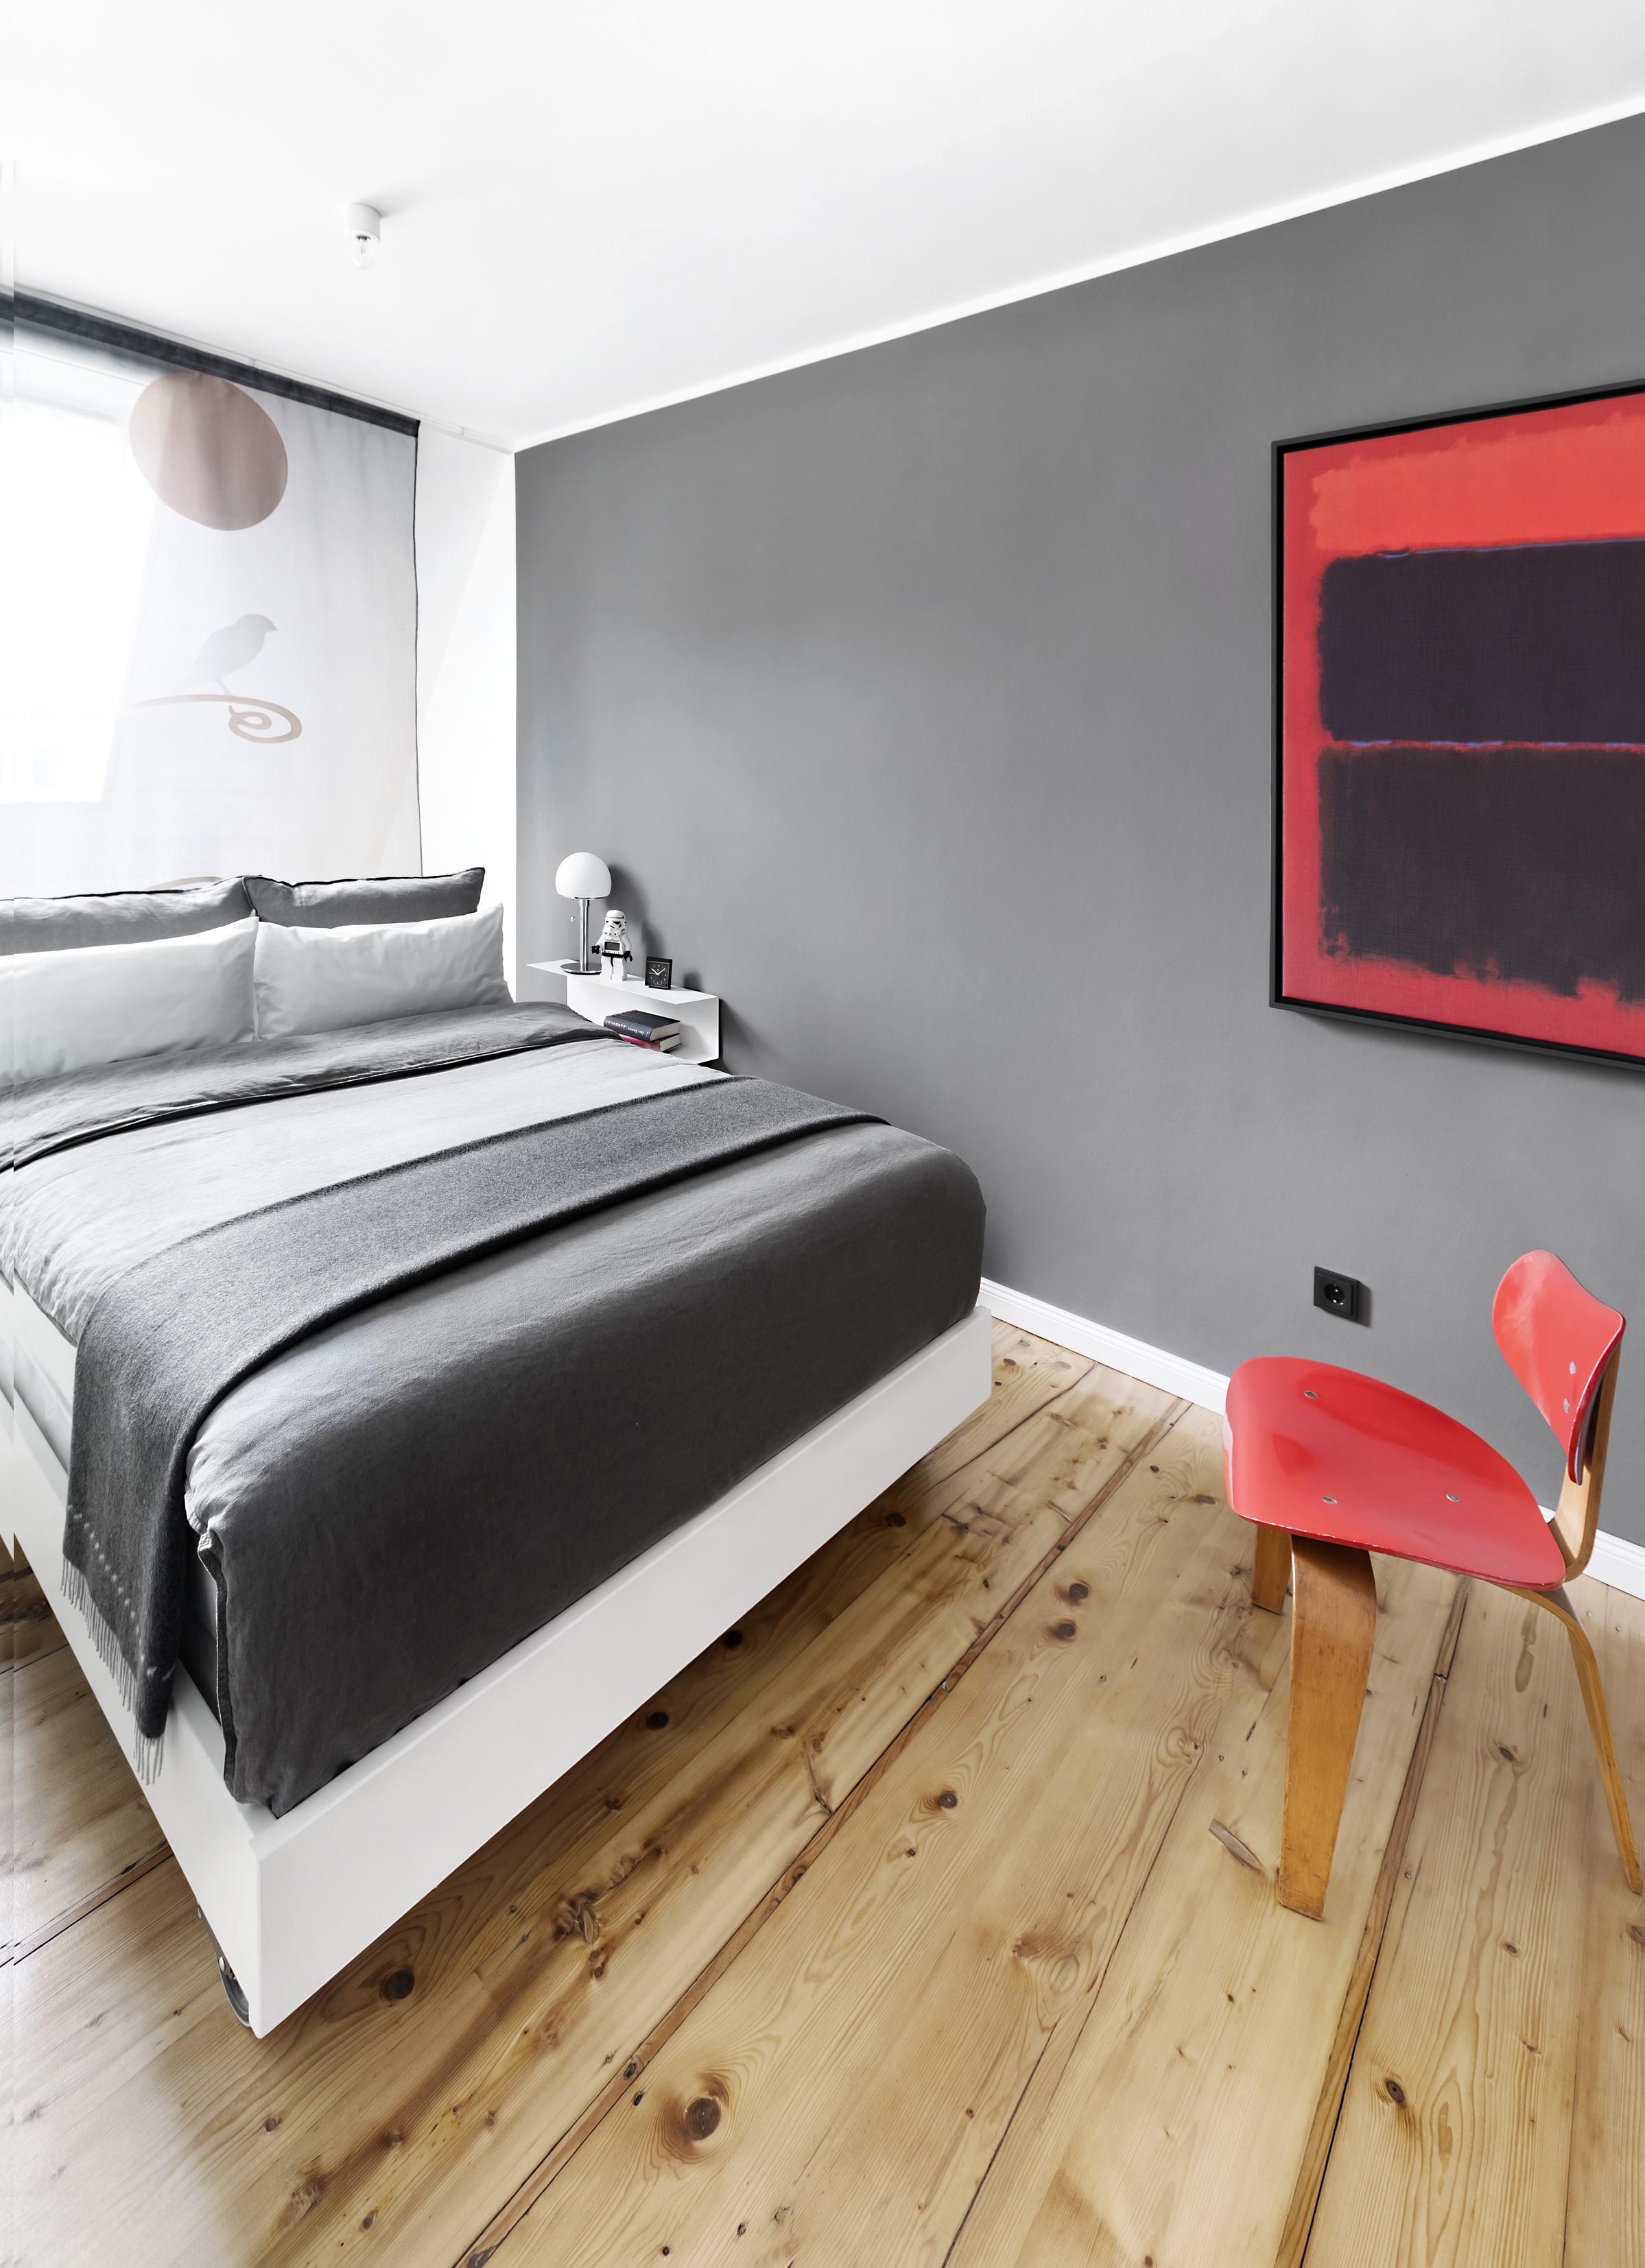 Schlafzimmer #bett #altbau ©Fotografie: Volkan Tural / Copyright: Pascal  Walter